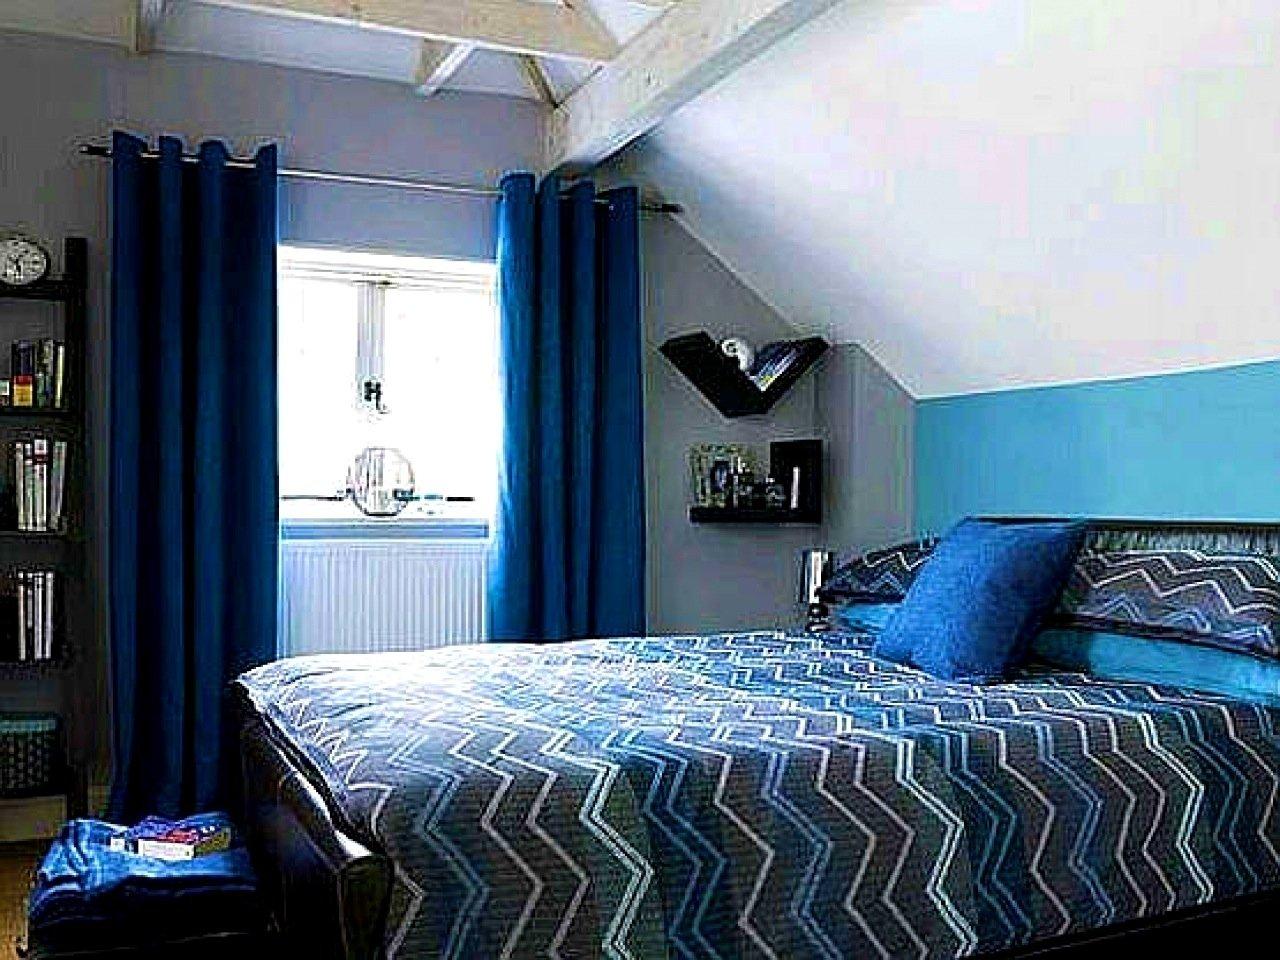 10 Lovable Blue And Black Bedroom Ideas light blue and black bedroom ideas nurani 2020